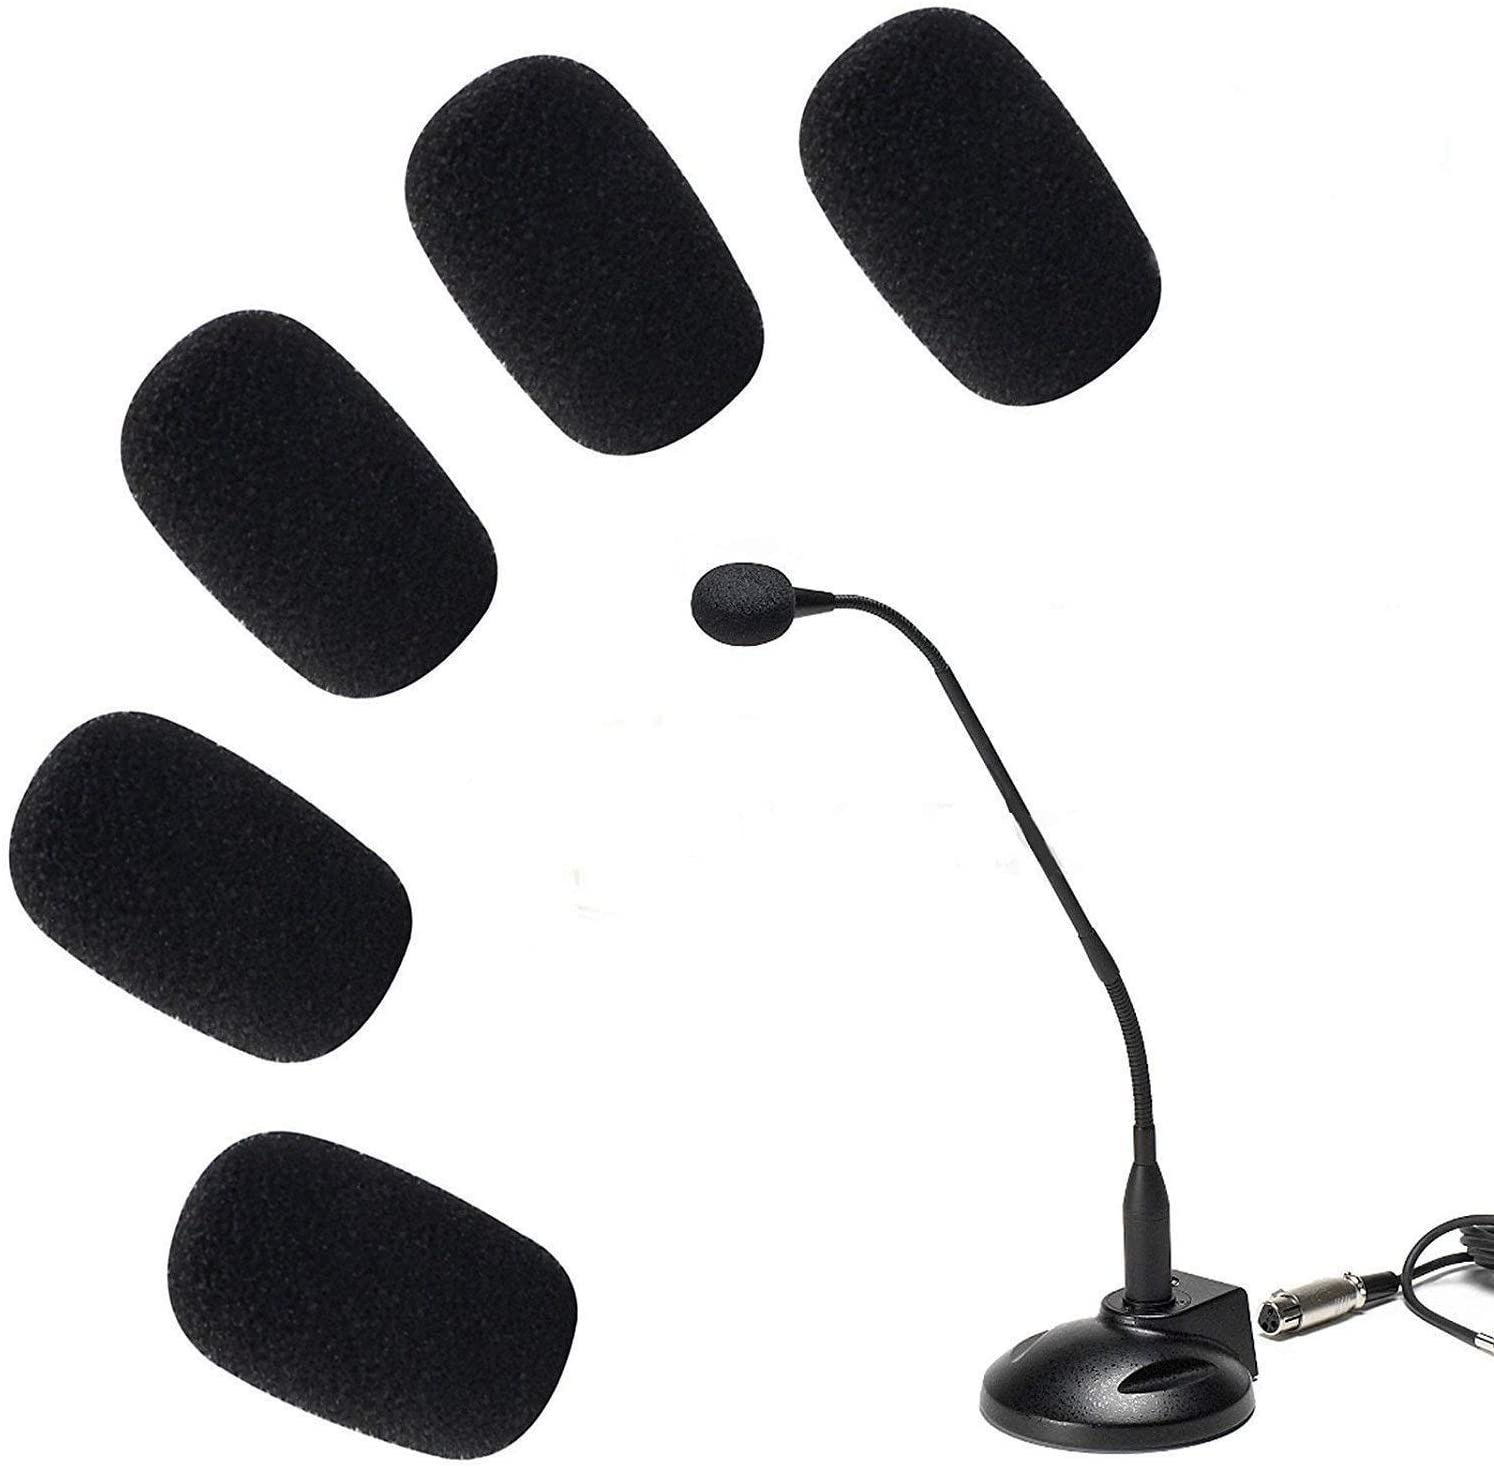 5PCS Handheld Stage Microphone Windschutz Schaum Mic CoverYRDE